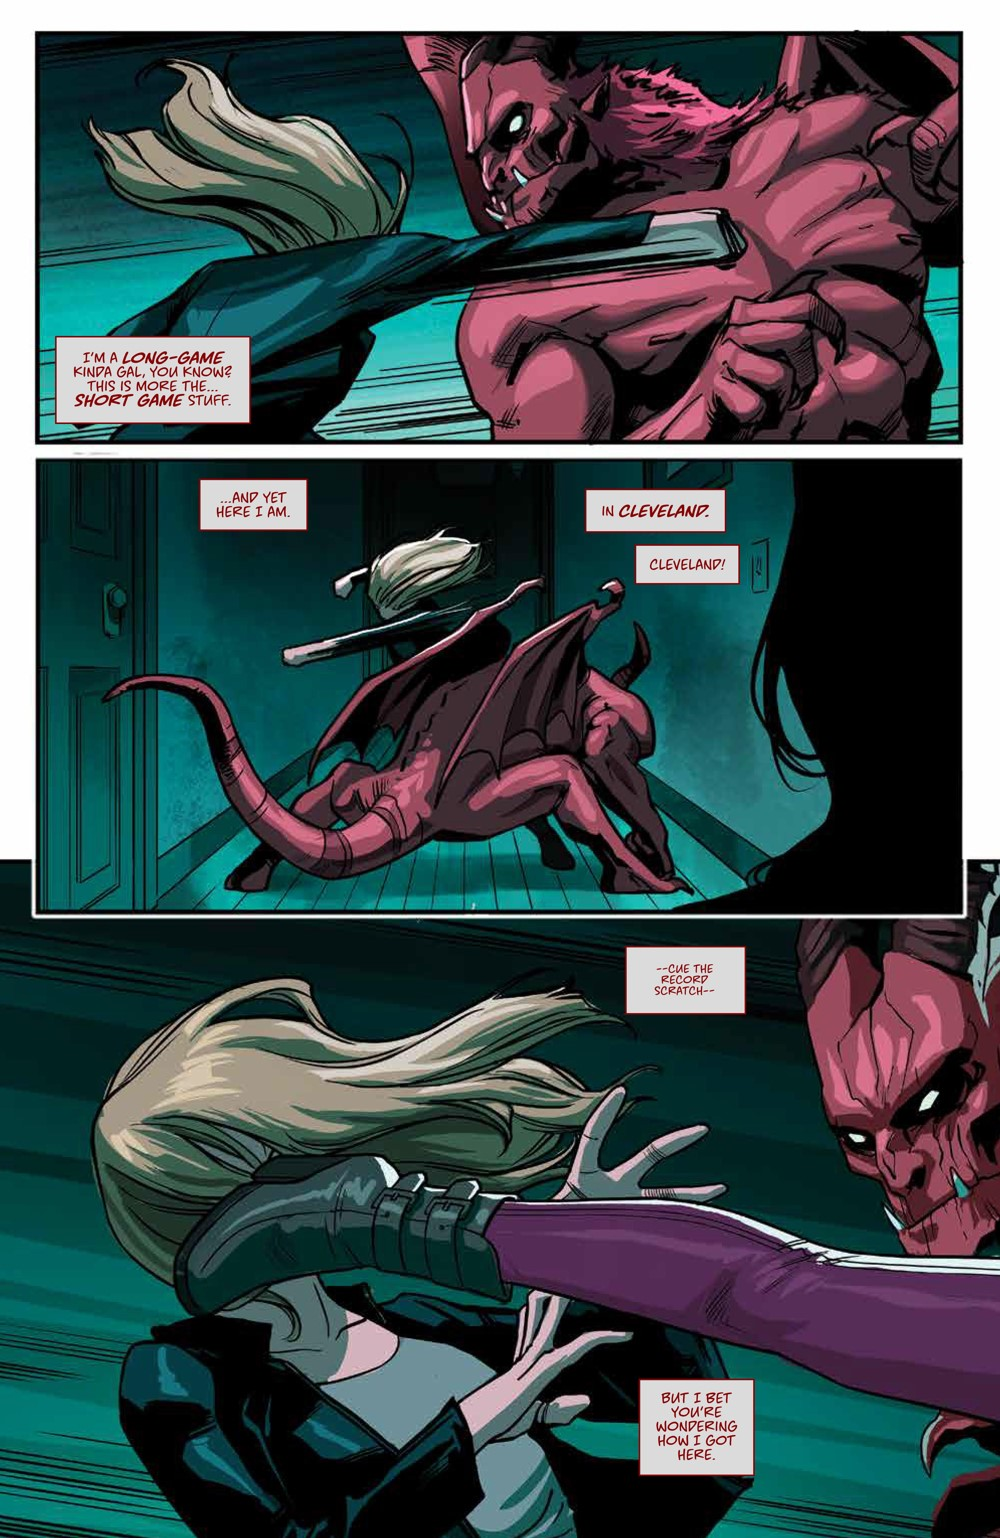 Buffy_v6_SC_PRESS_10 ComicList Previews: BUFFY THE VAMPIRE SLAYER VOLUME 6 SECRETS OF THE SLAYER TP